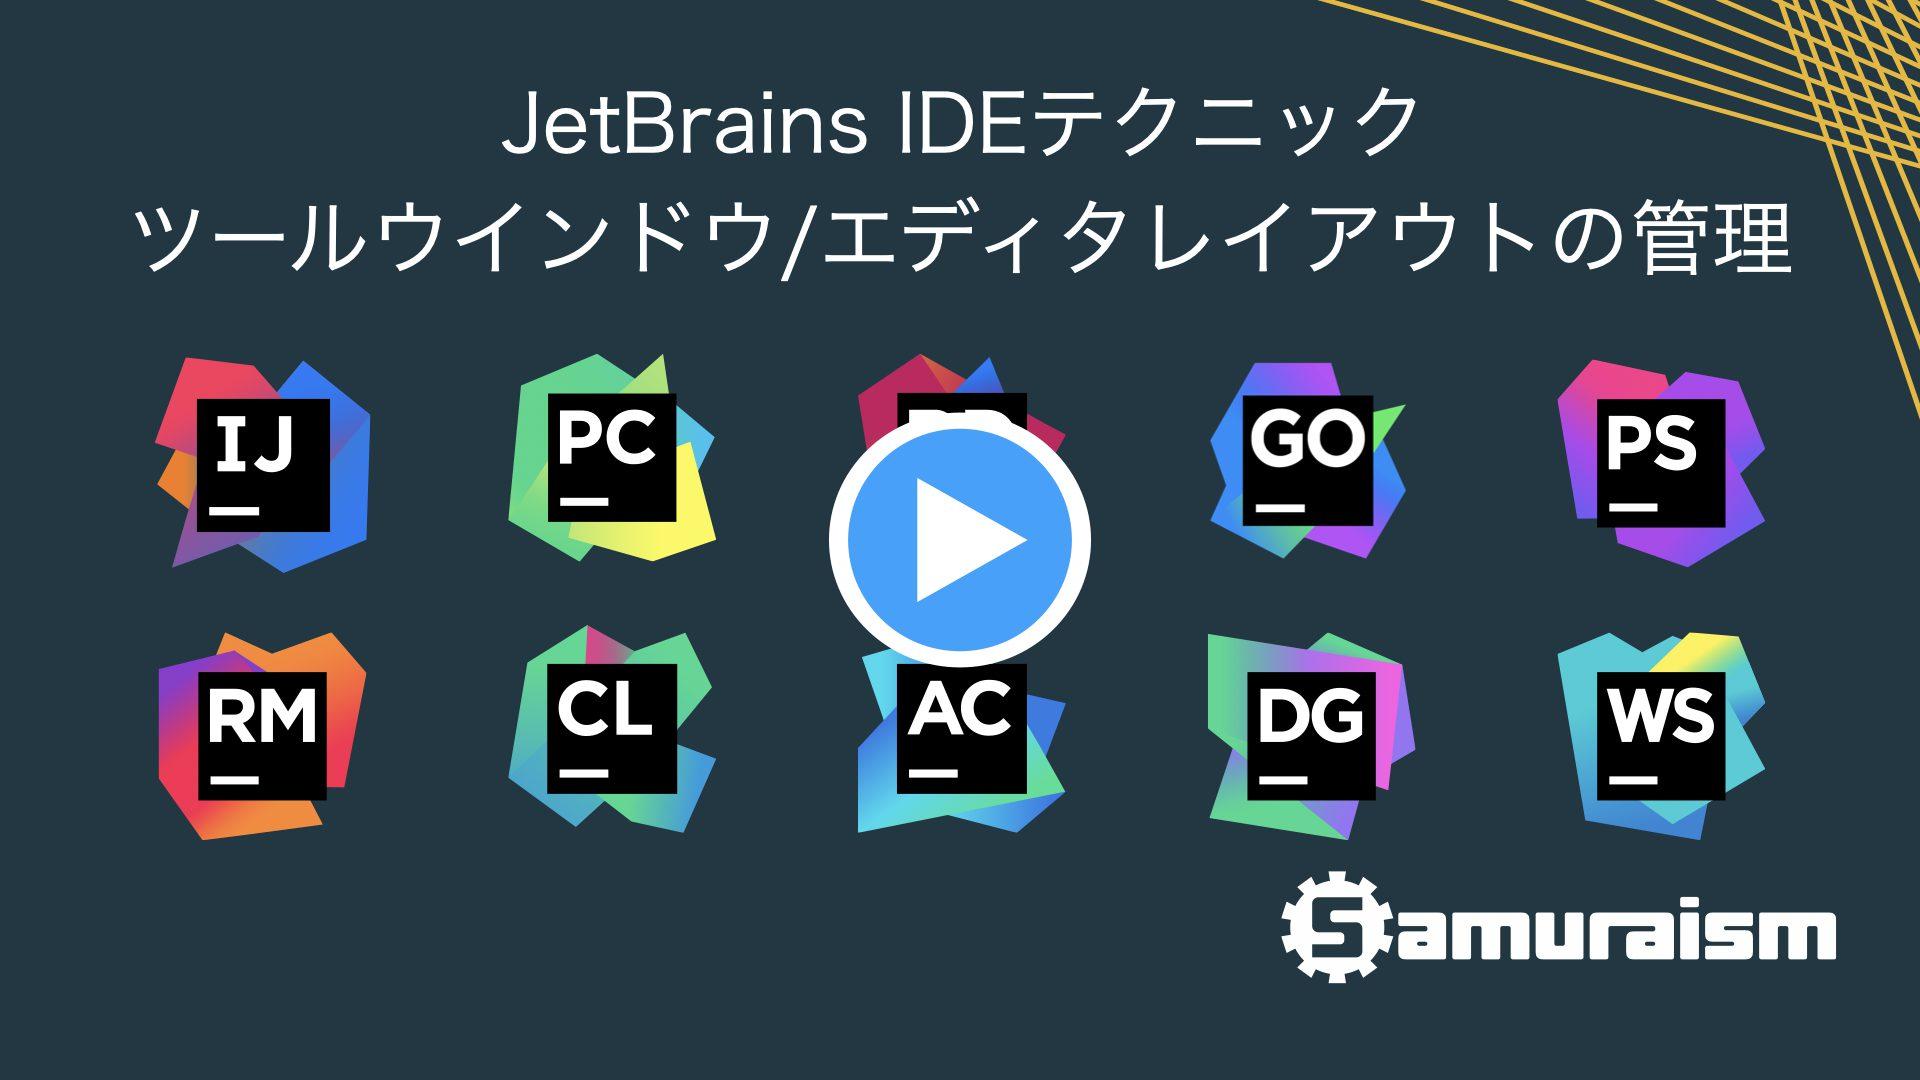 #JetBrainsIDEテクニック – ツールウインドウ/エディタレイアウトの管理 #jbtips